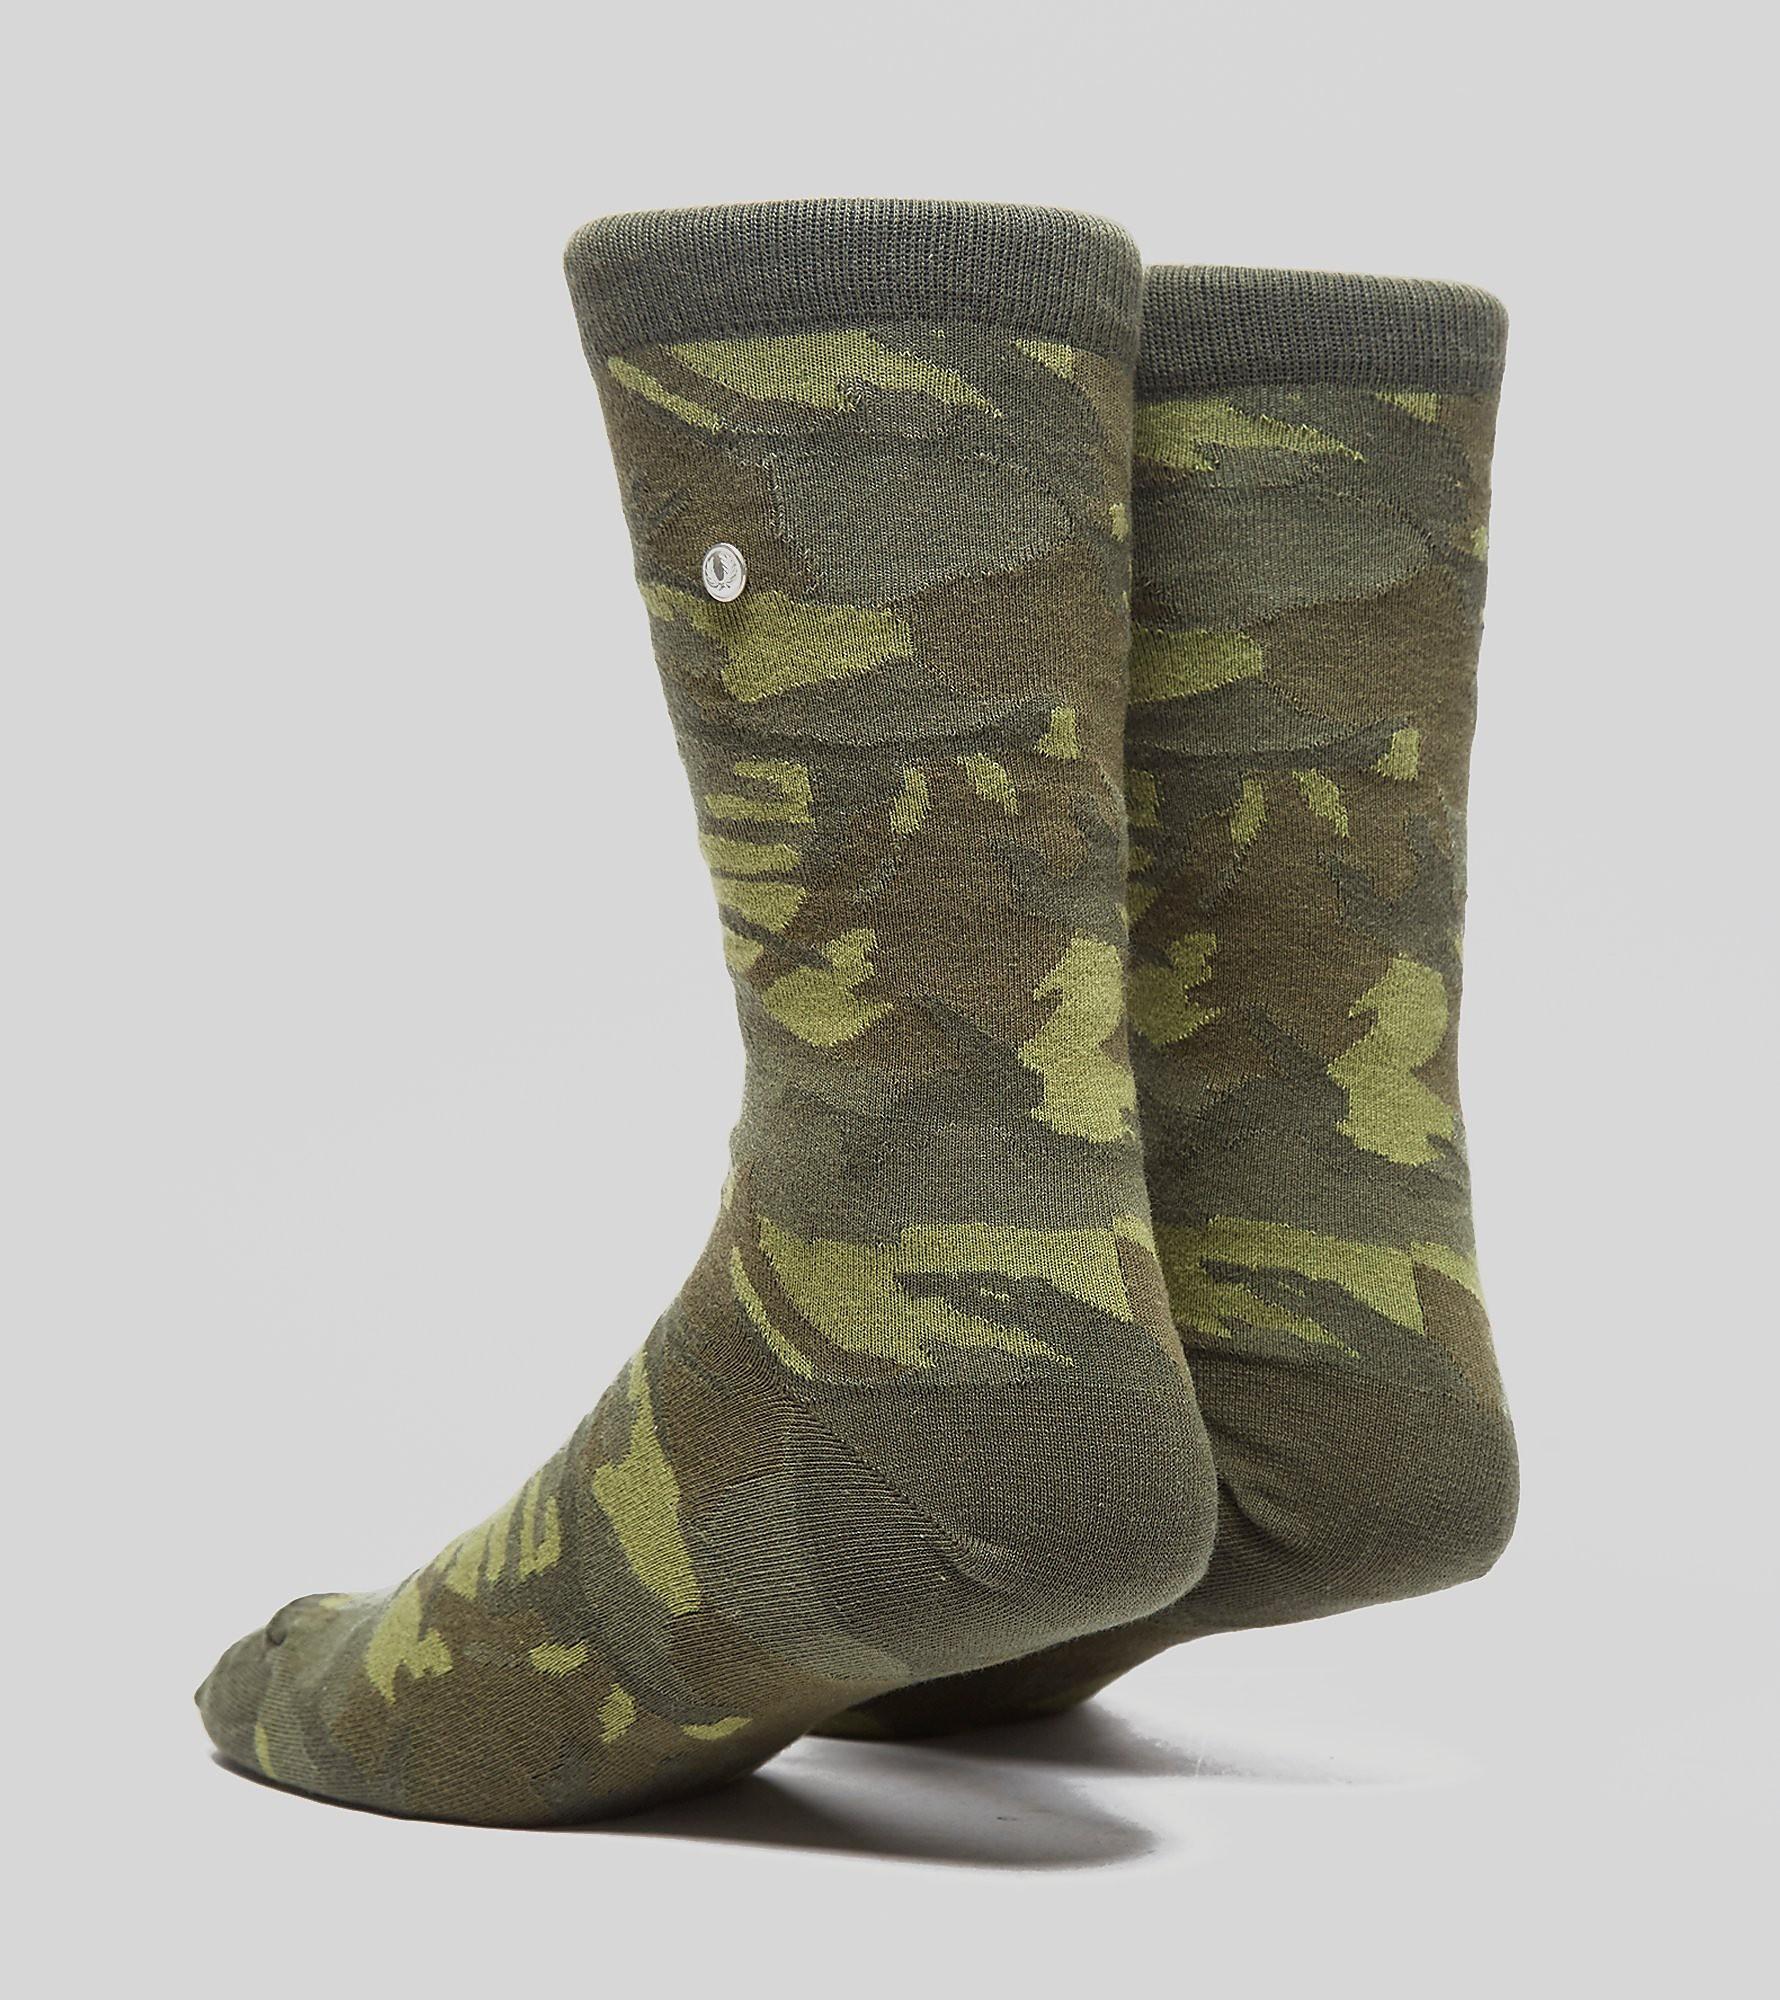 Fred Perry Tonal Camo Socks